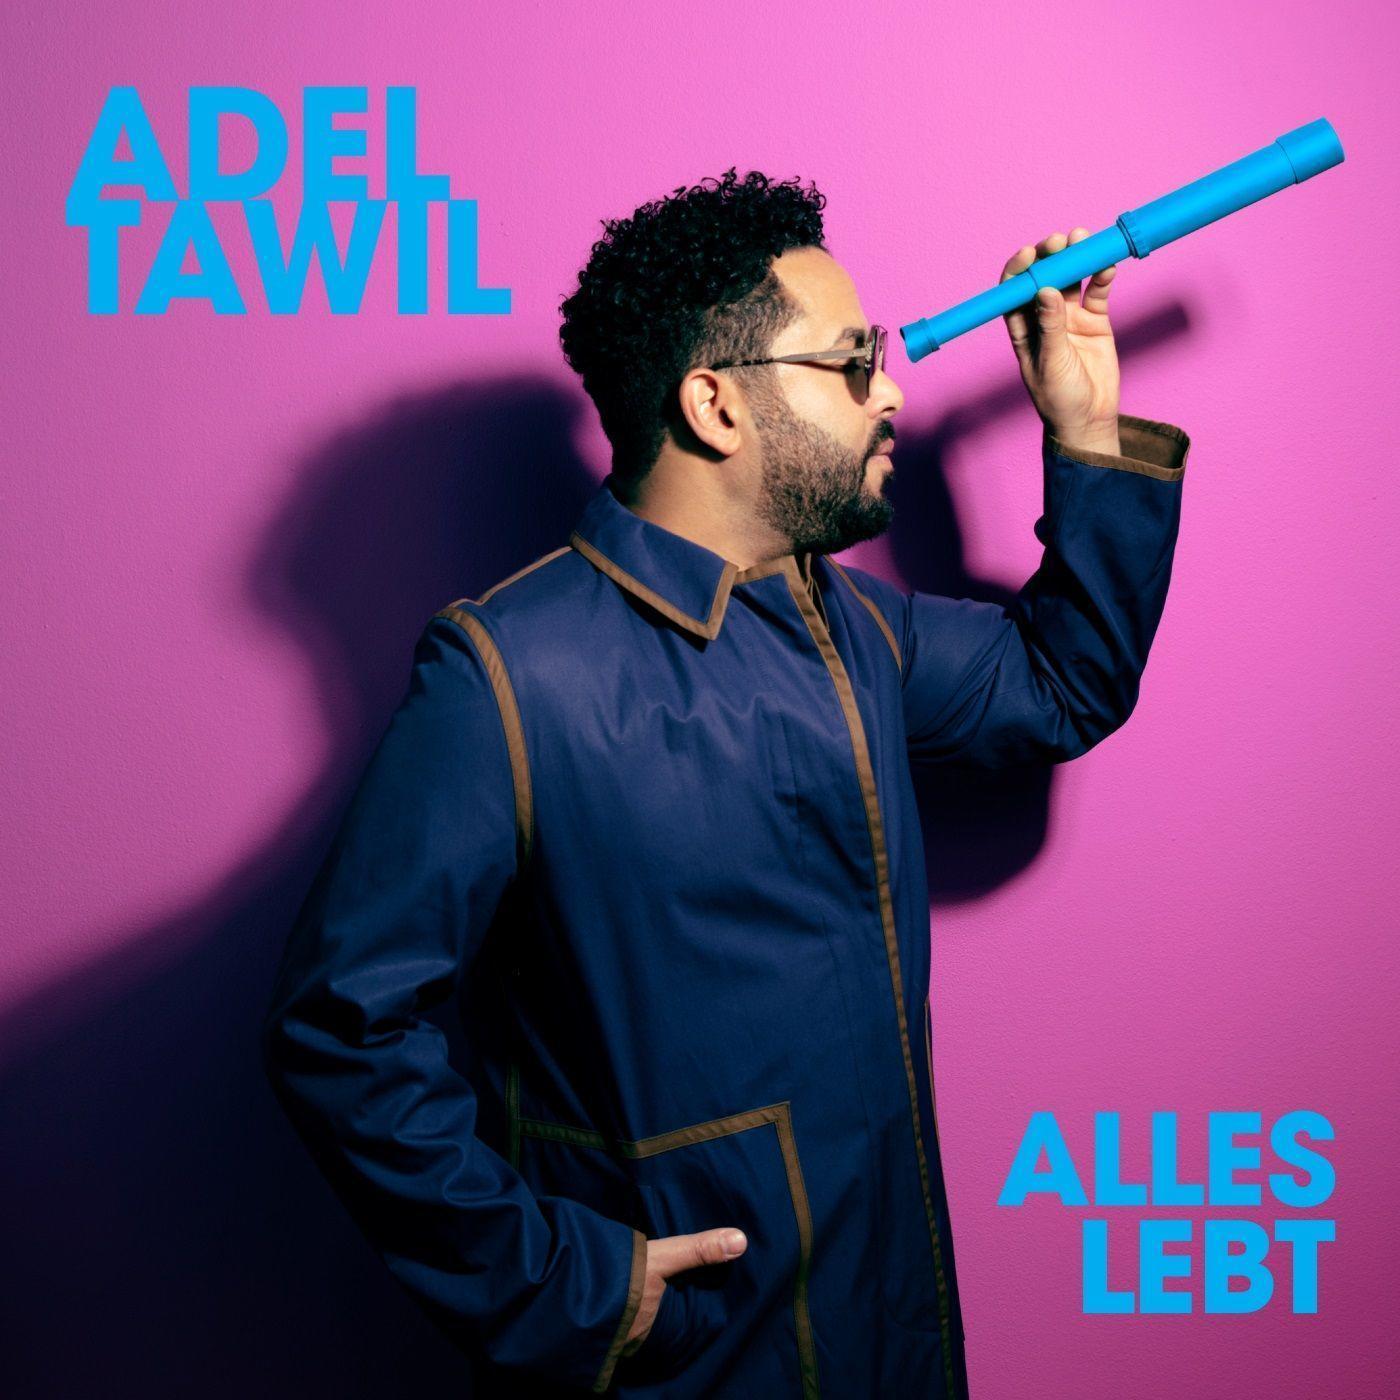 Alles Lebt (Adel Tawil) für 17,54 Euro